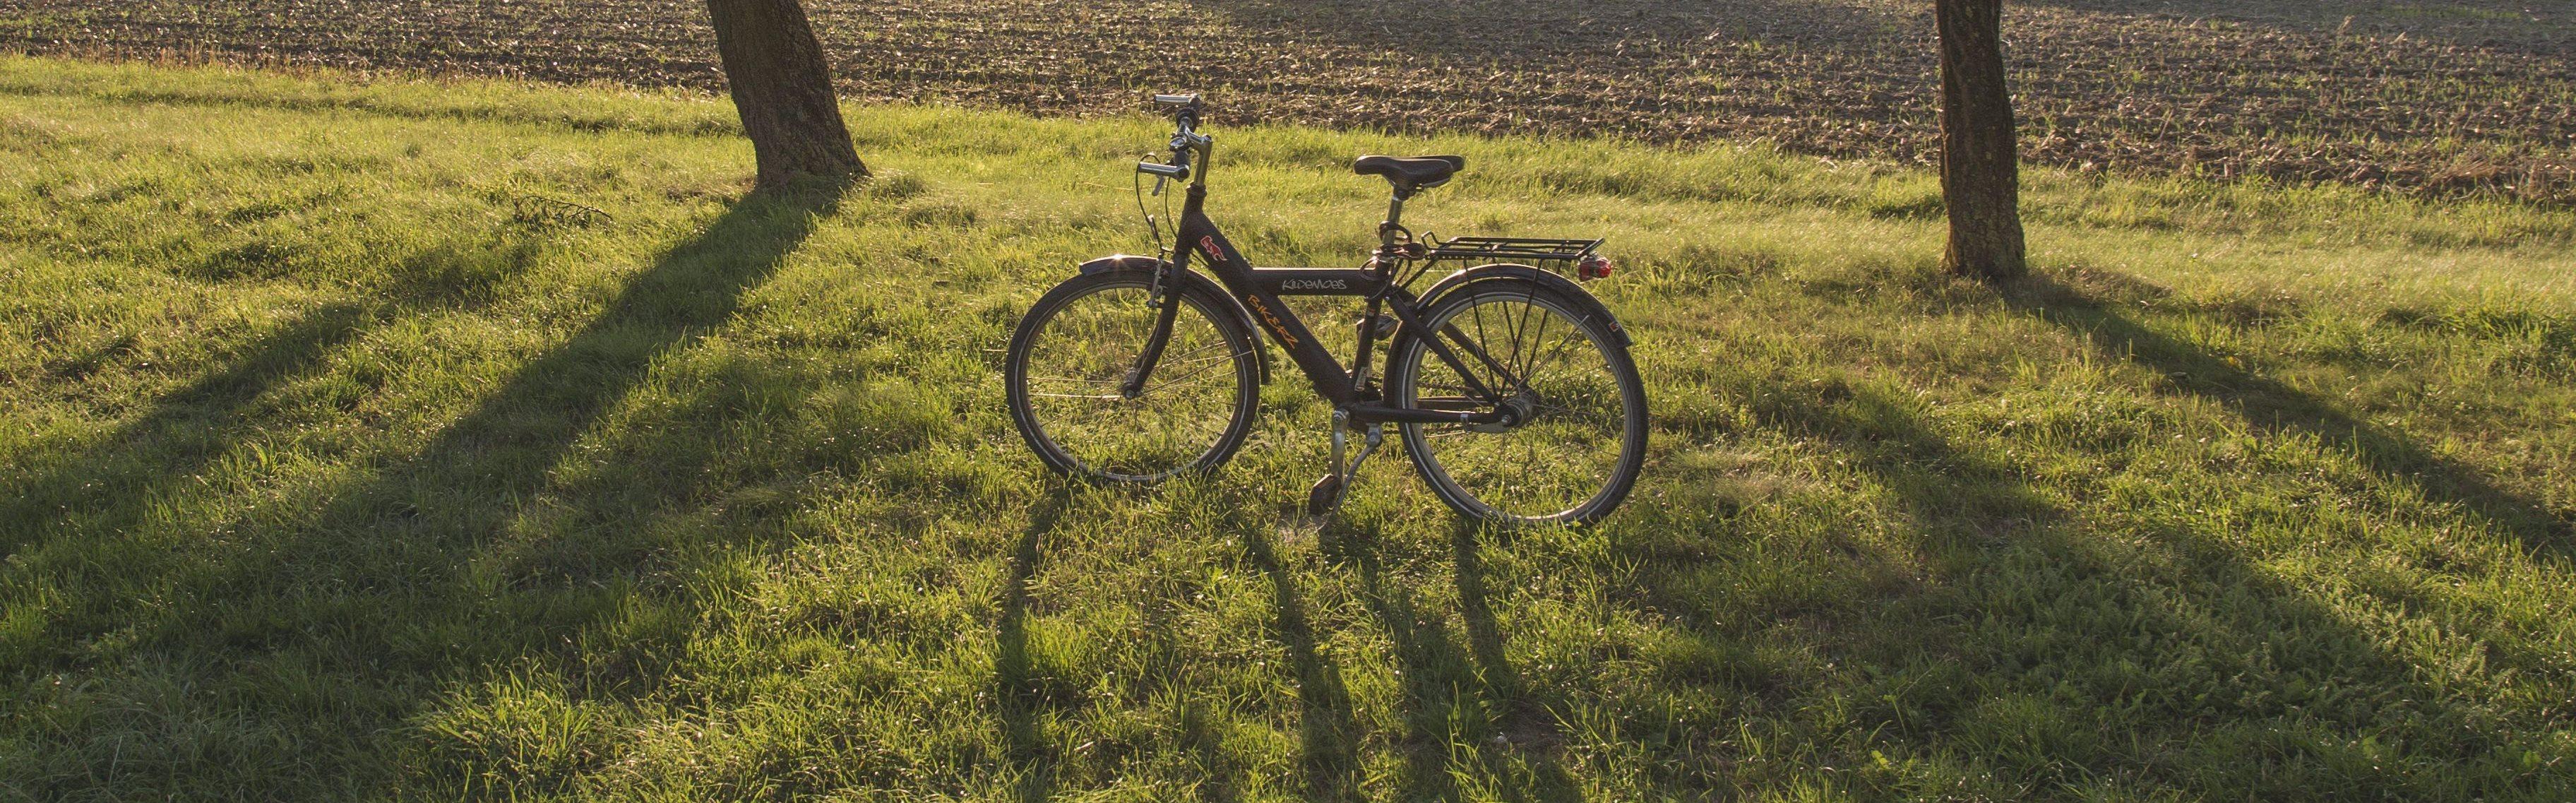 Bike in a field at sunset